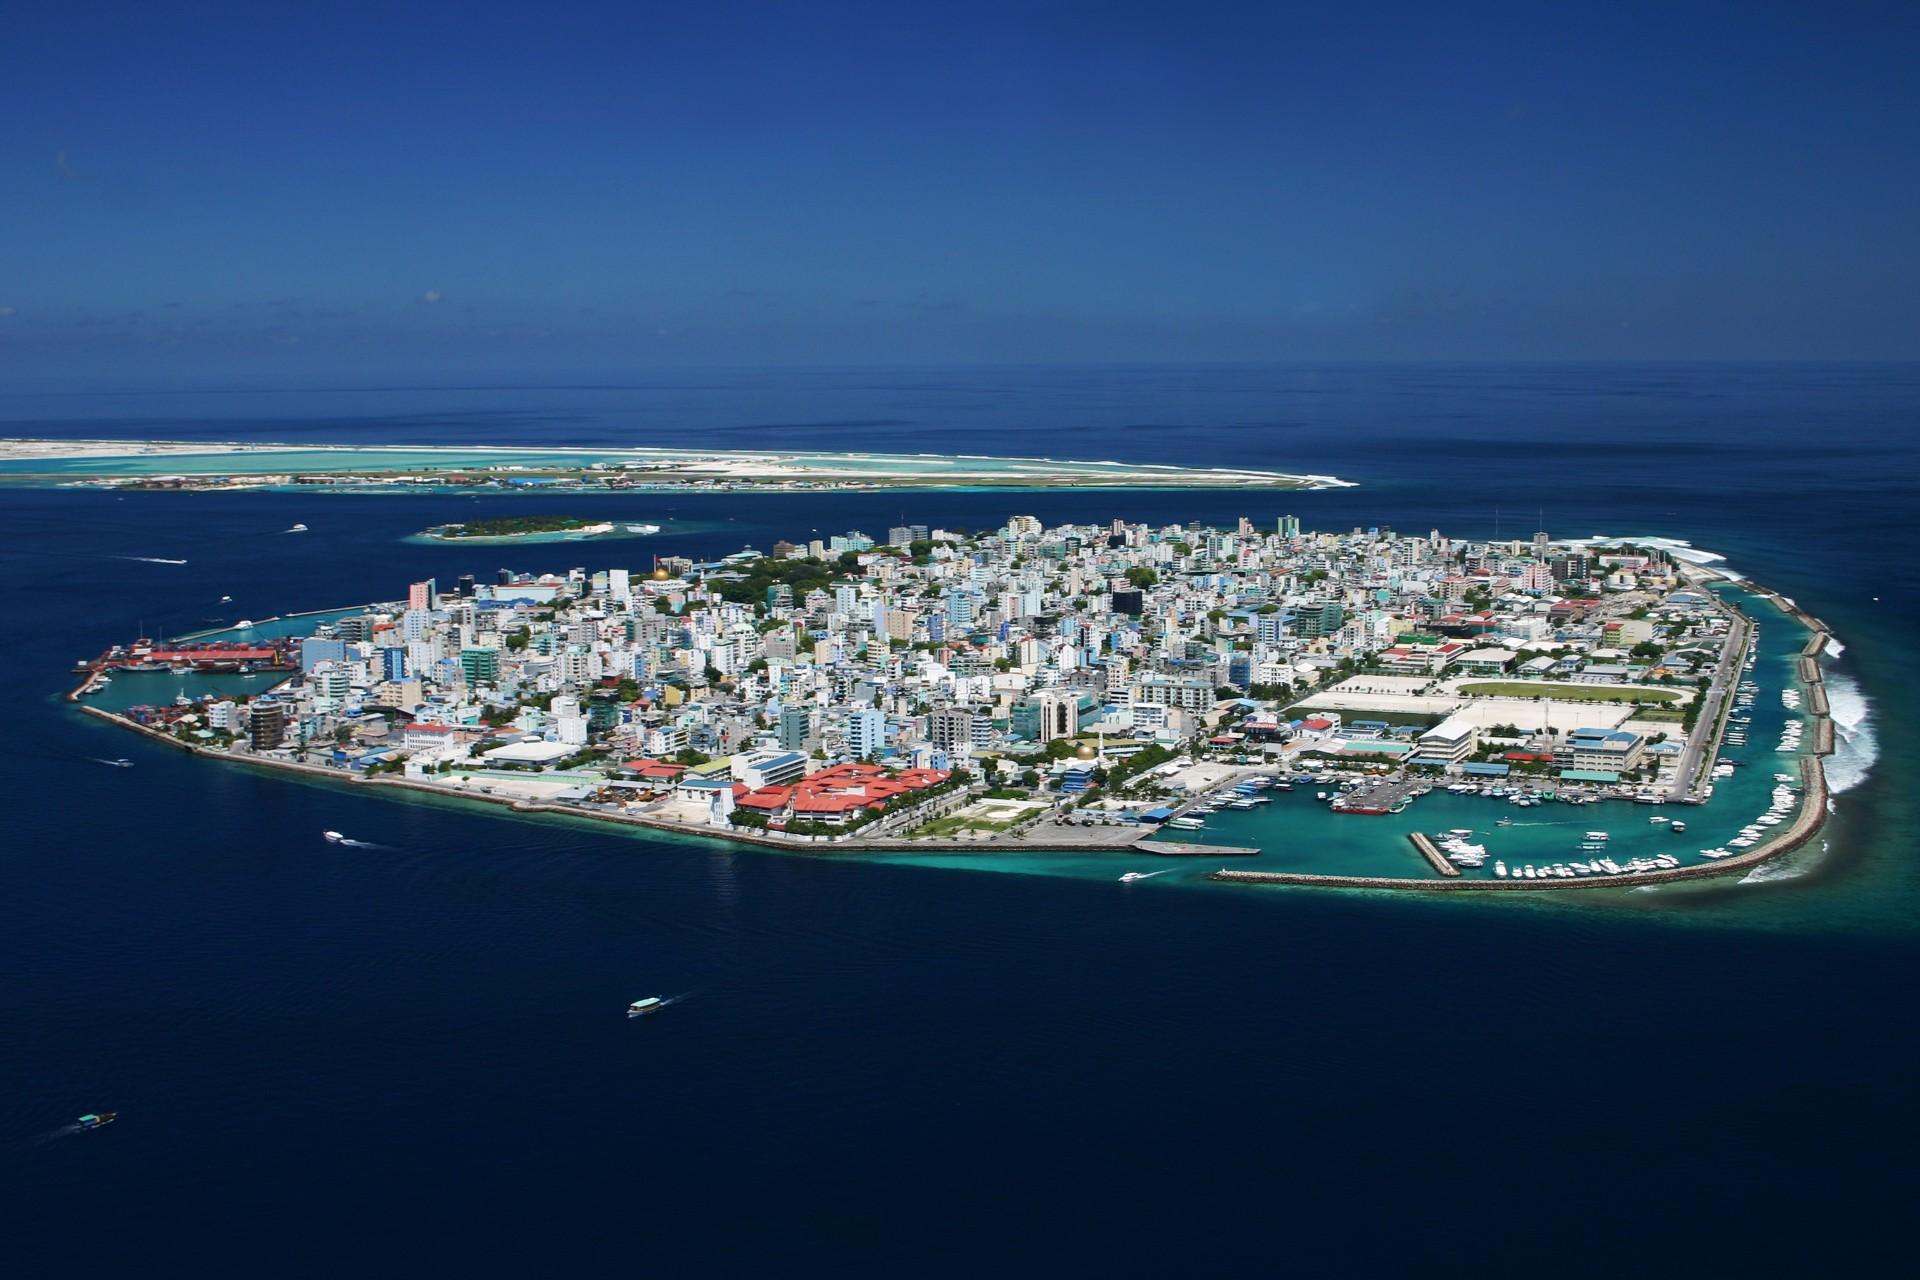 Maldives Population in 2017